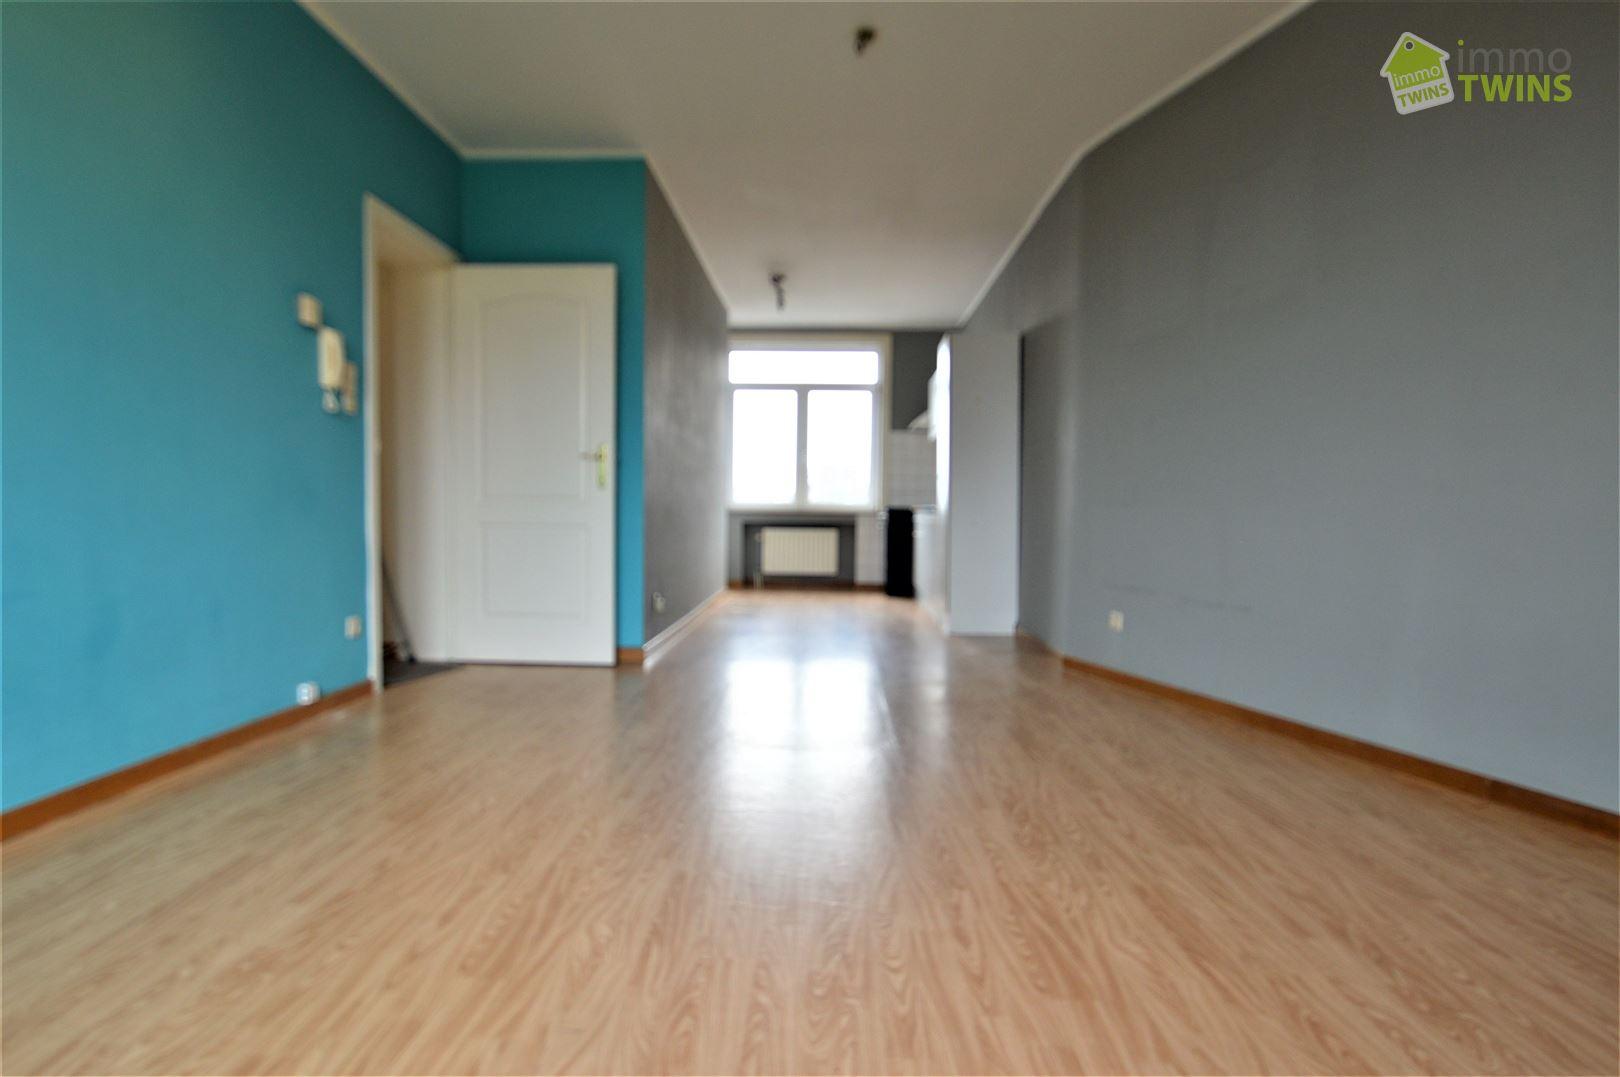 Foto 3 : Appartement te 9200 DENDERMONDE (België) - Prijs € 575